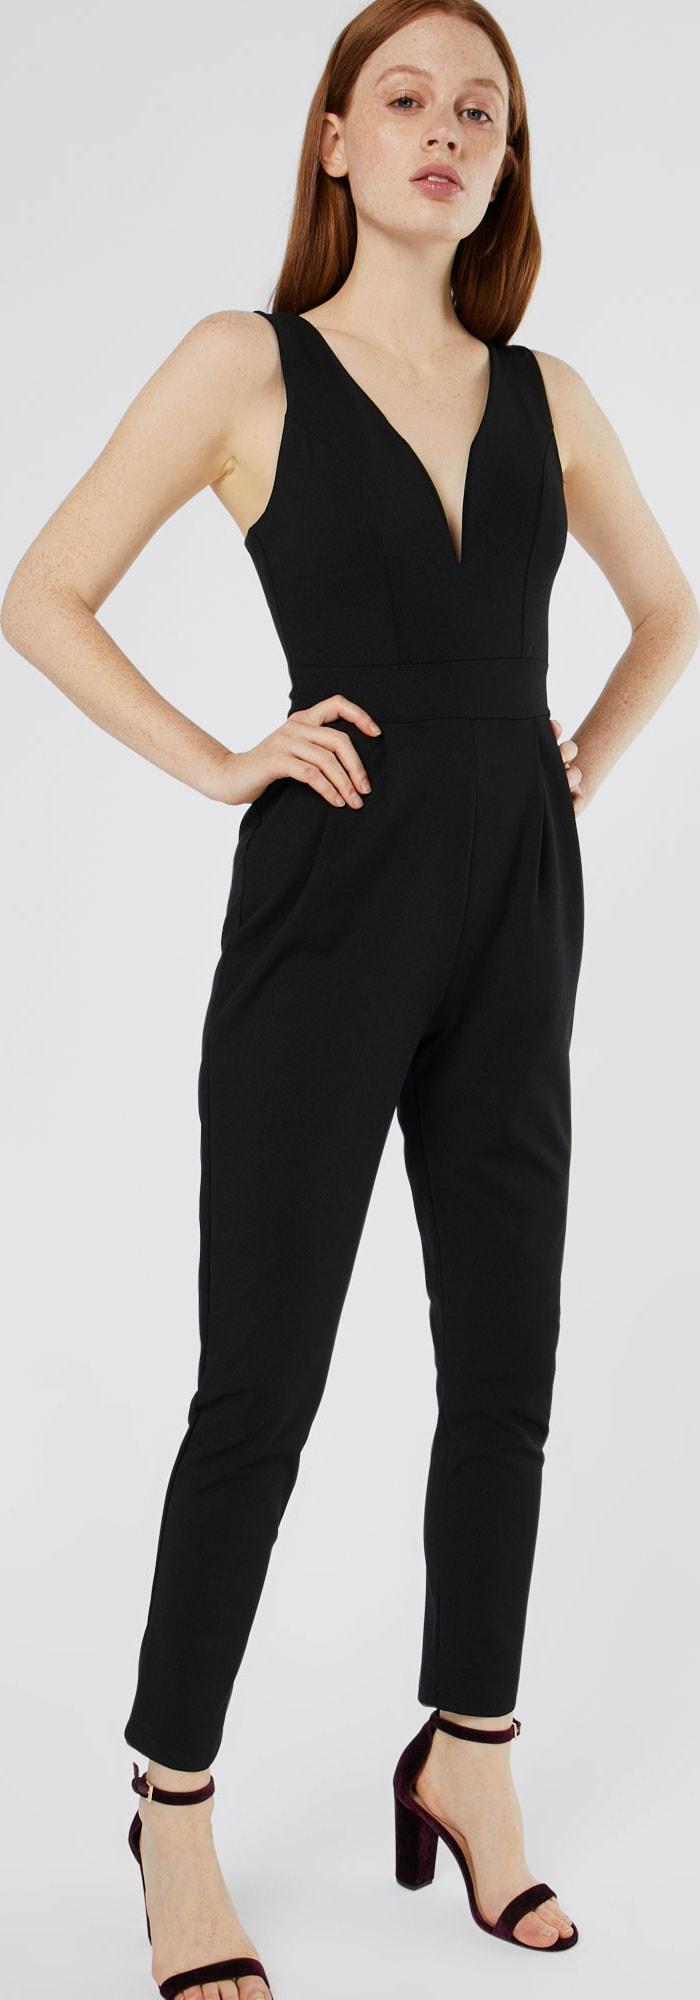 wal g jumpsuit mit tiefem v ausschnitt in schwarz about you. Black Bedroom Furniture Sets. Home Design Ideas